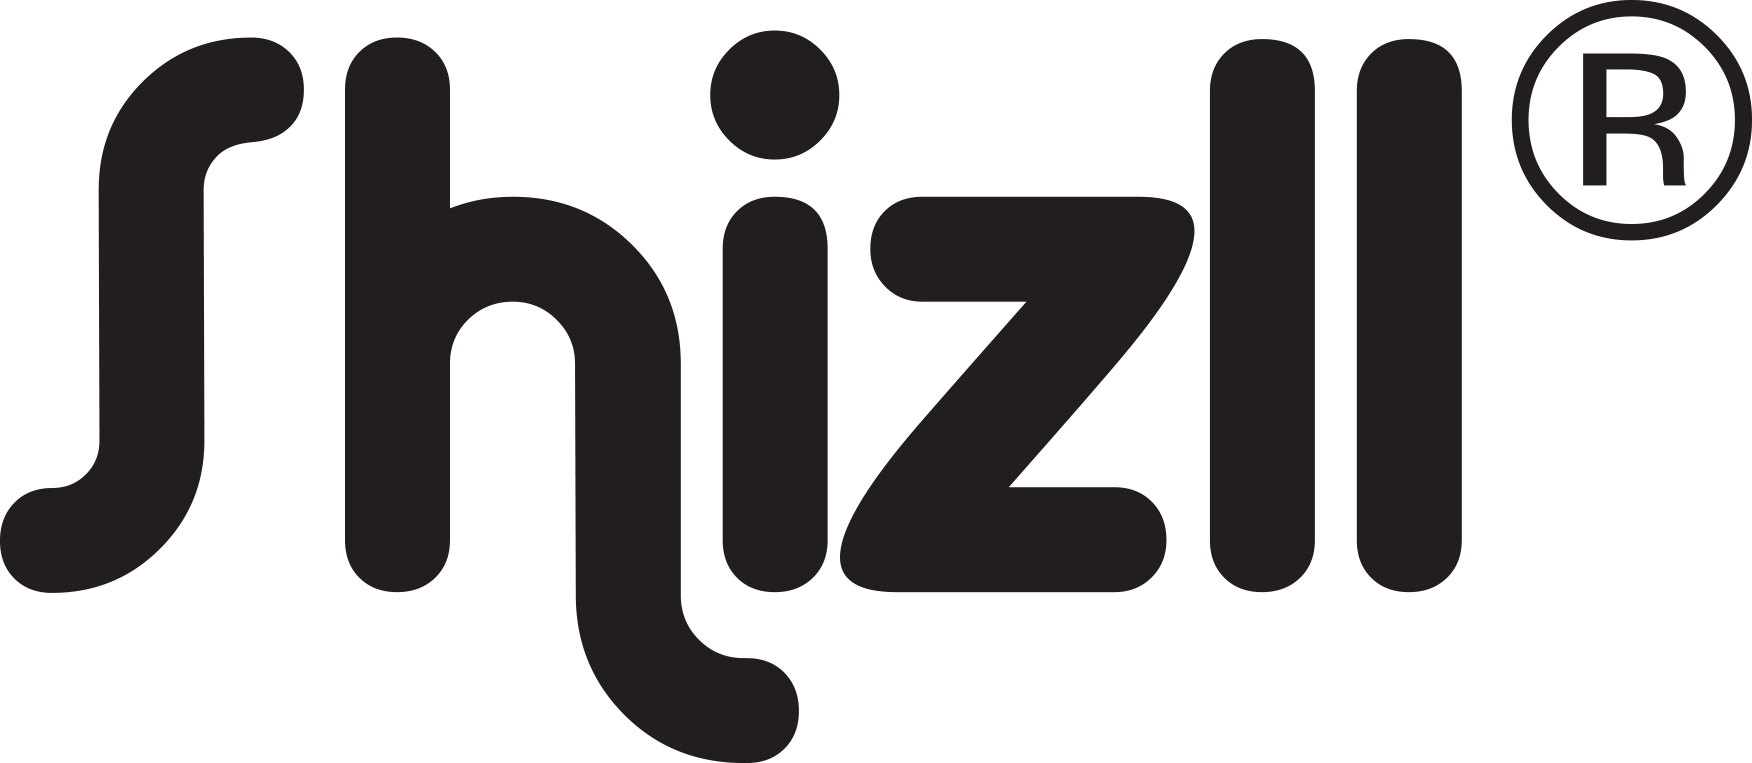 Shizll Logo